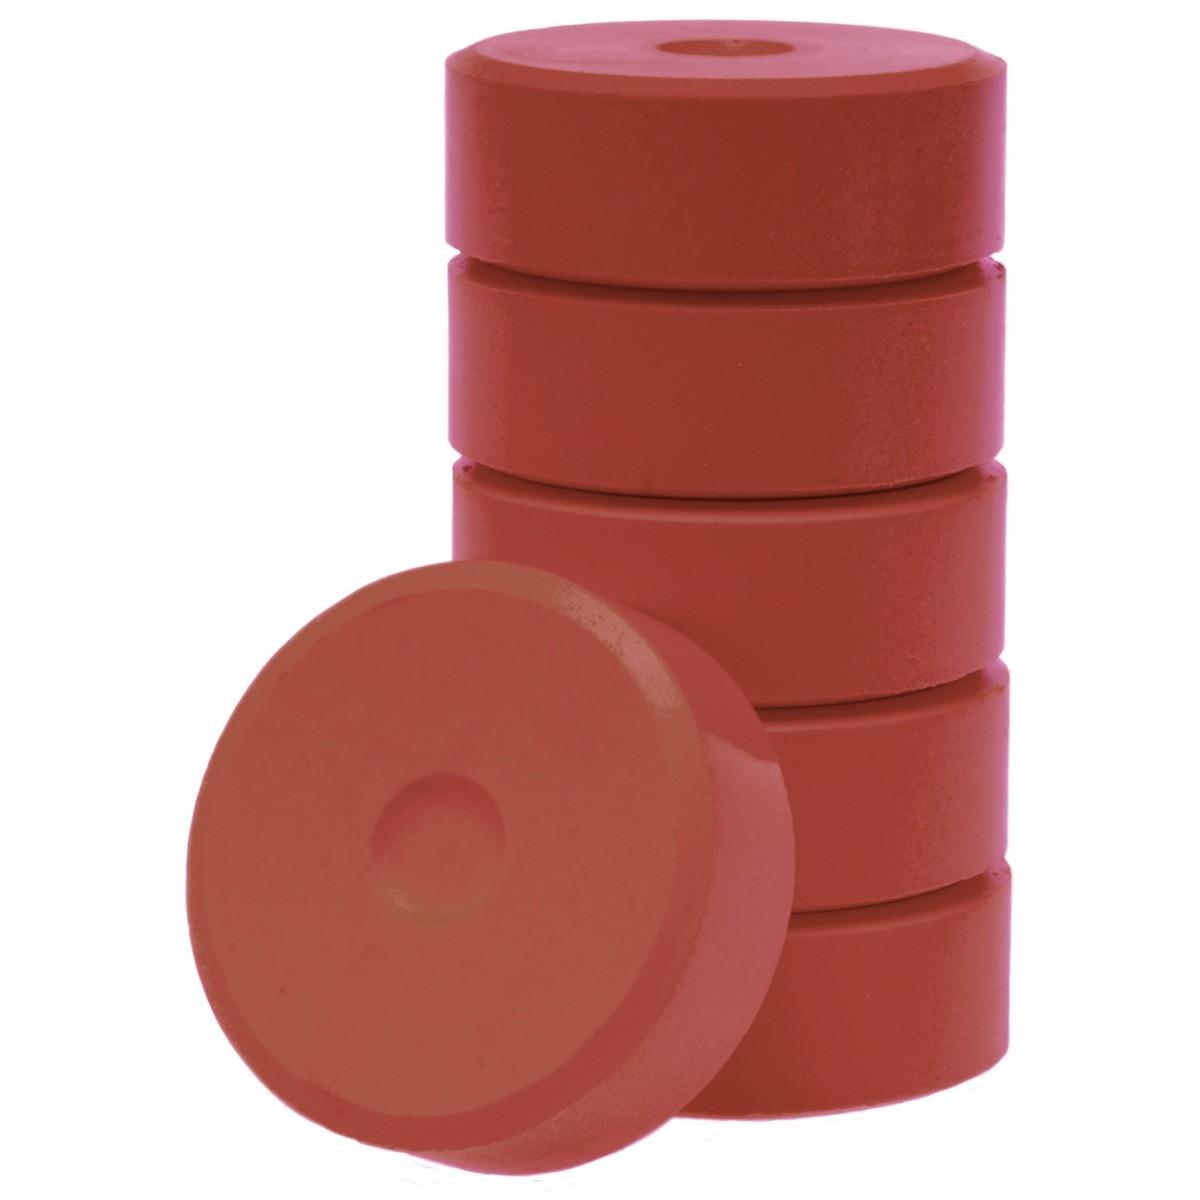 Tempera-Blöcke 55mm hellbraun 6 Stück - hochwertige Tempera Farb Pucks / Farbtabletten